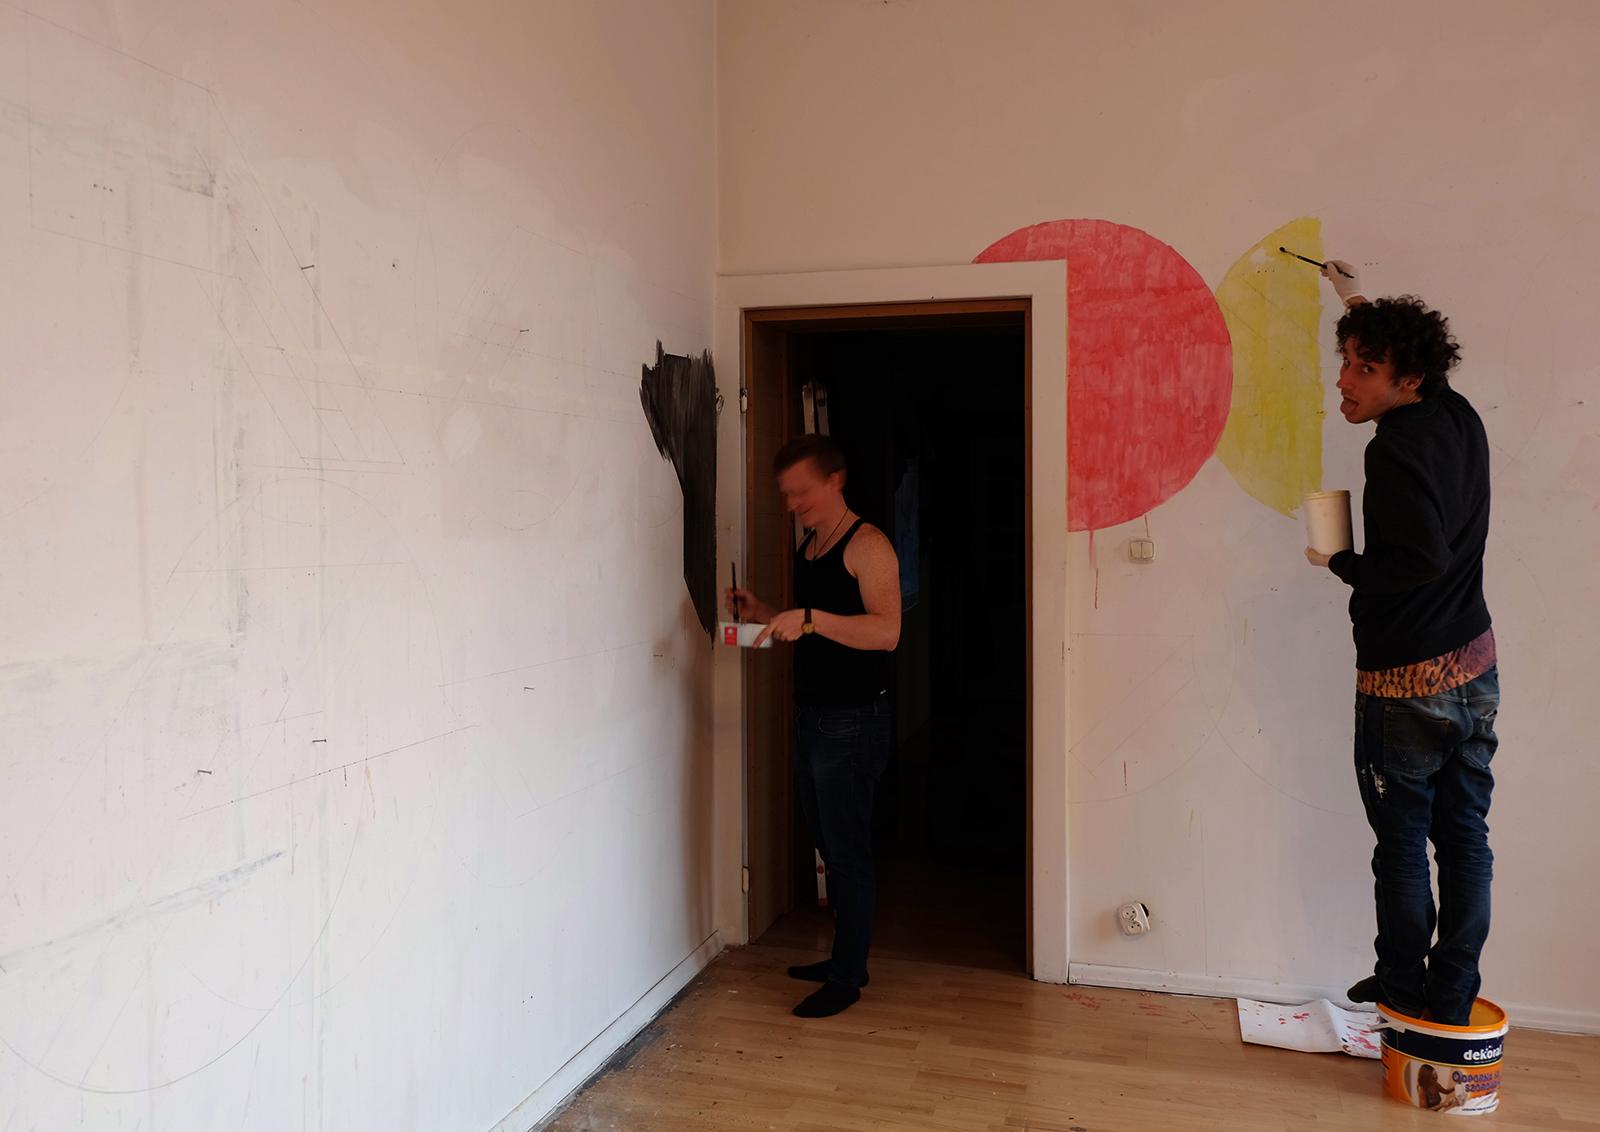 rusin-blazej-serhii-torbinov-peace-project-06